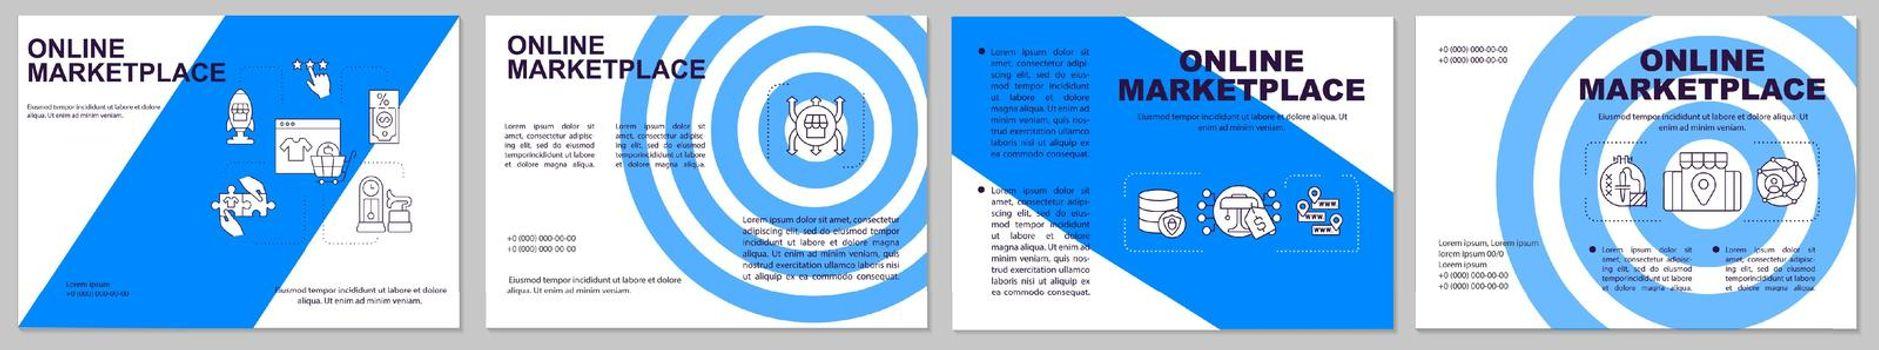 Online marketplace brochure template